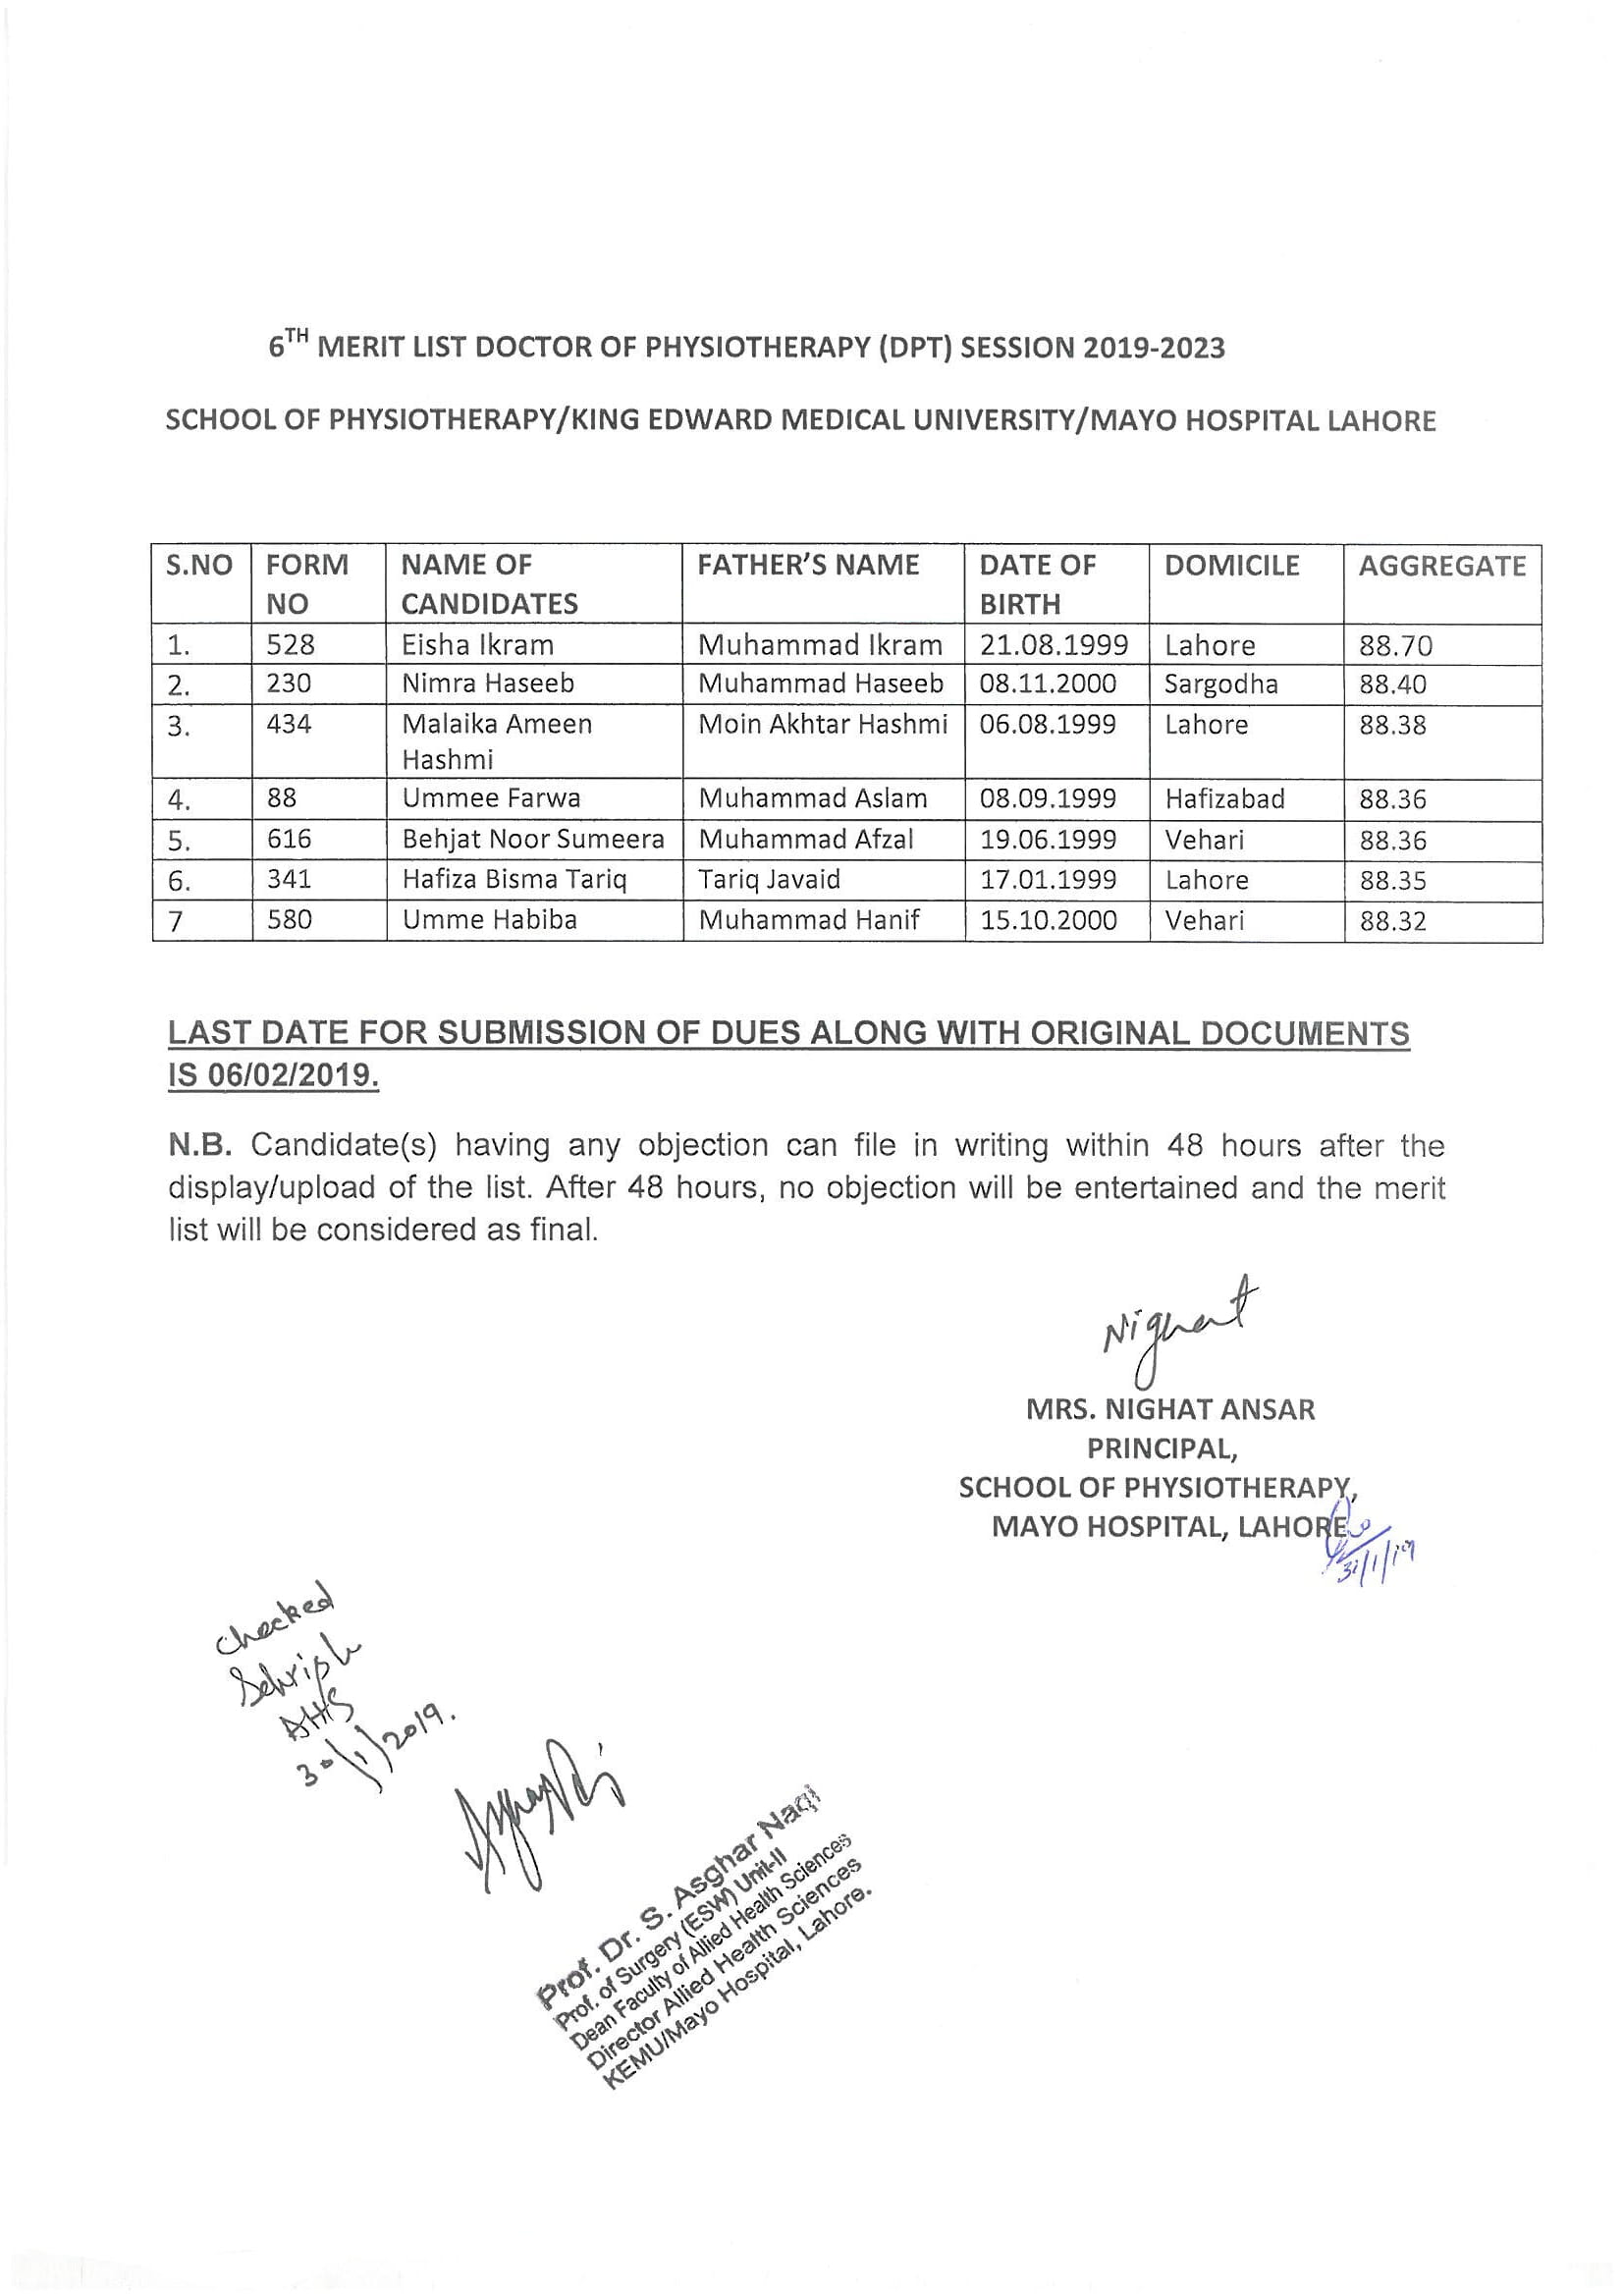 6th Merit List DPT at King Eward Medical University, Lahore